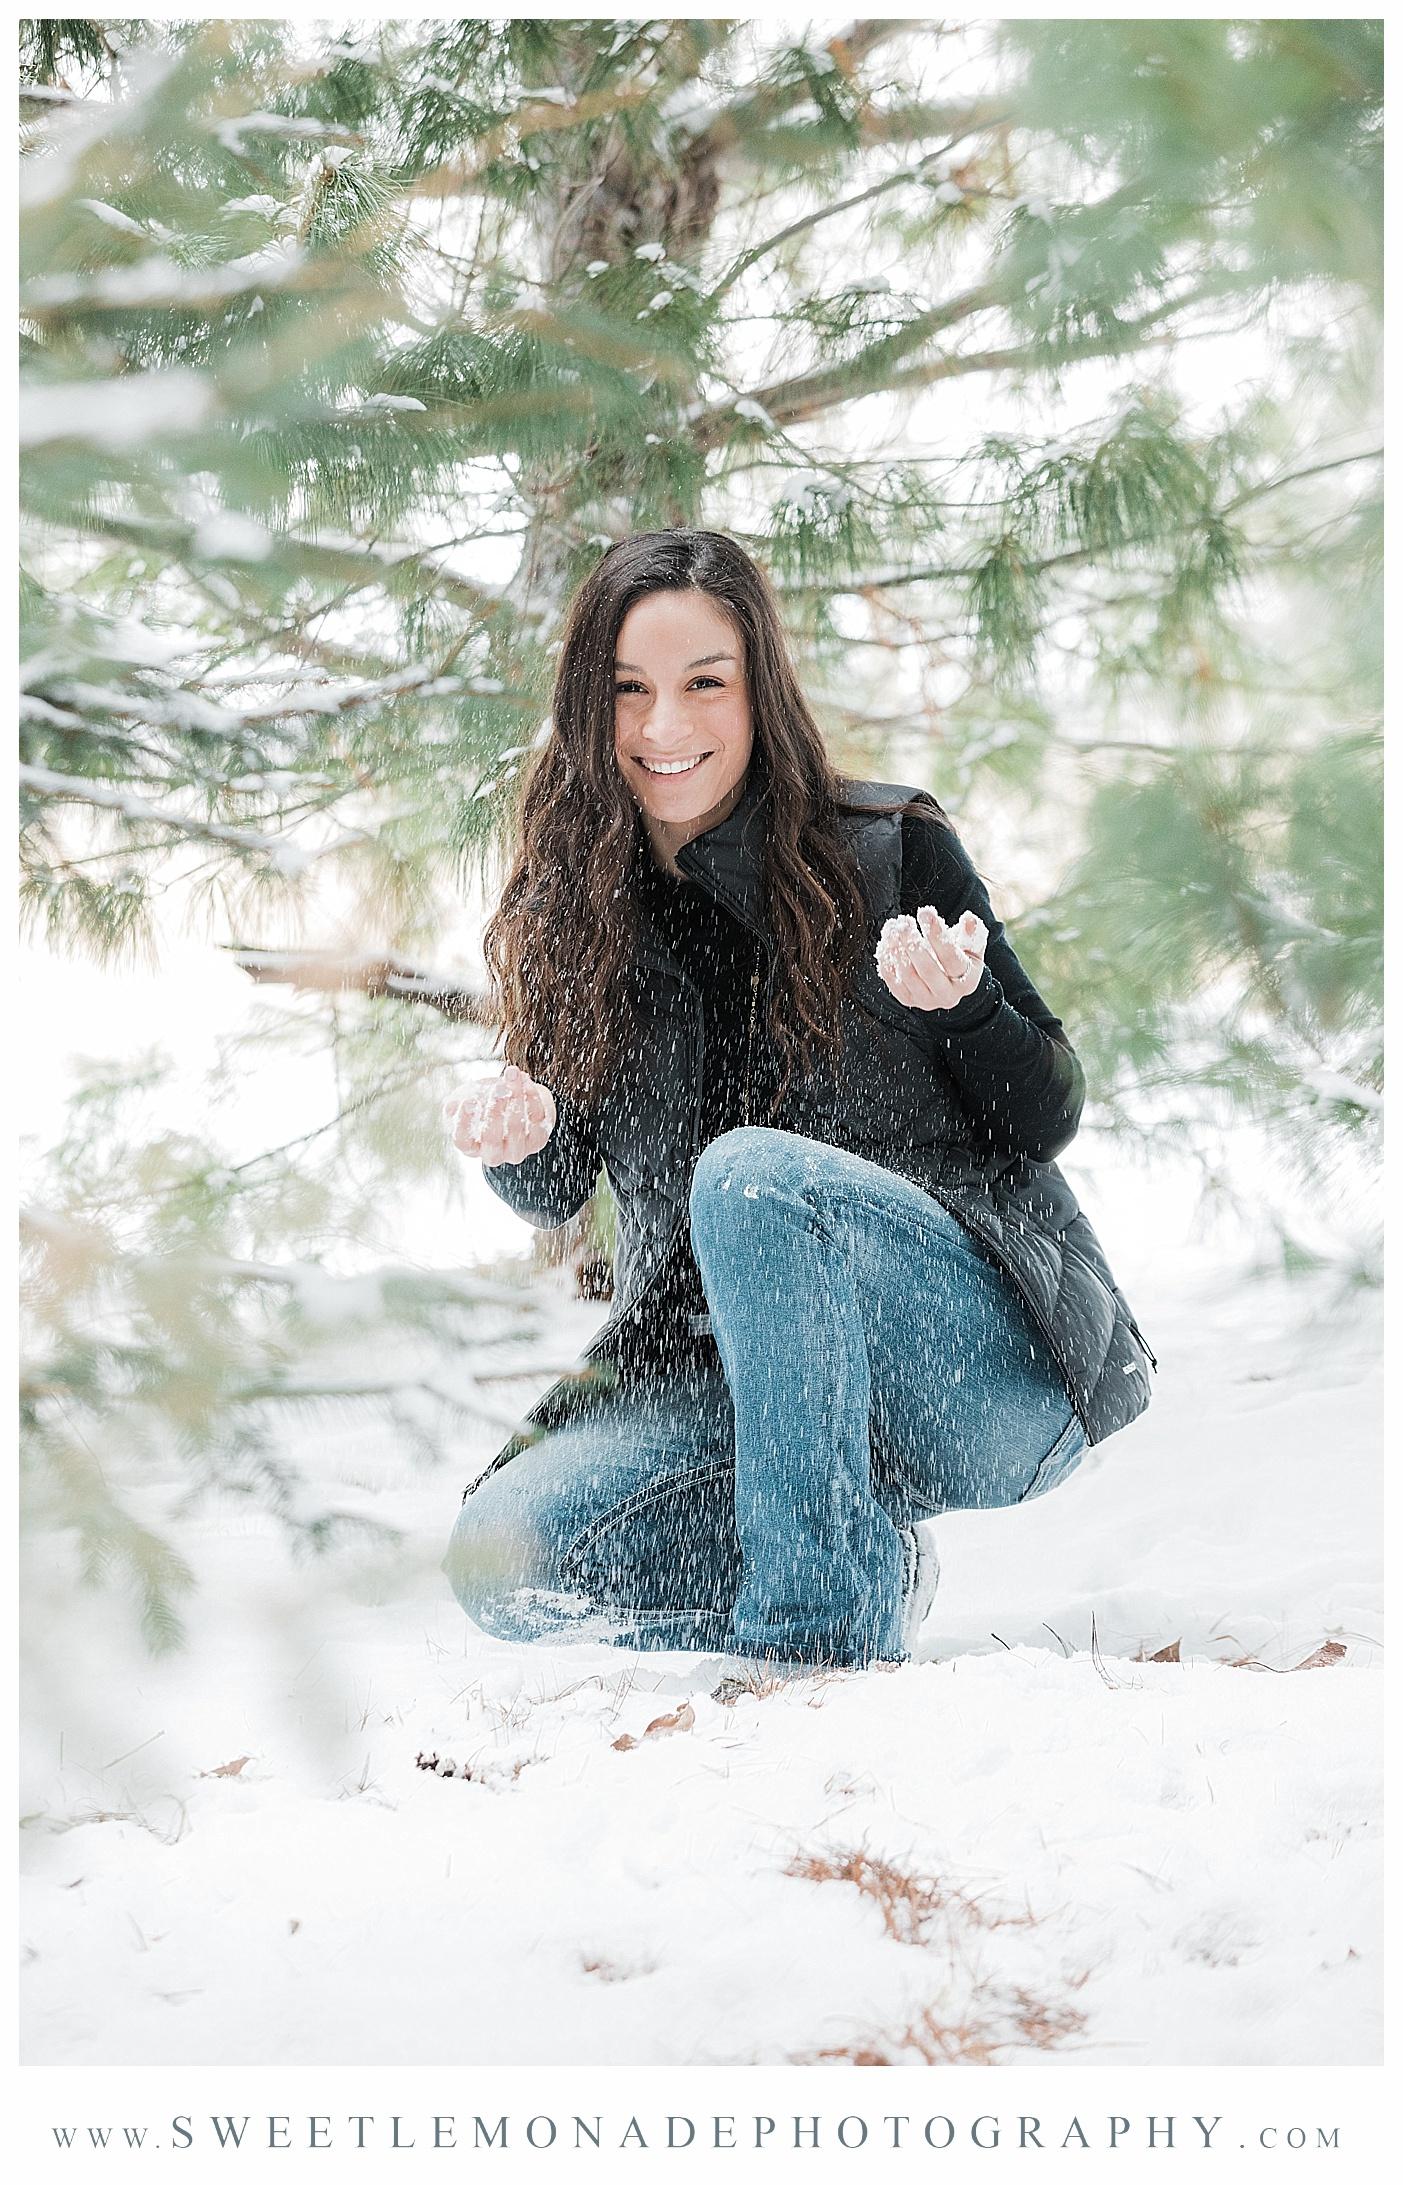 mahomet-illinois-snow-senior-pics-winter-clothing-boutique-sweet-lemonade-photography_2084.jpg